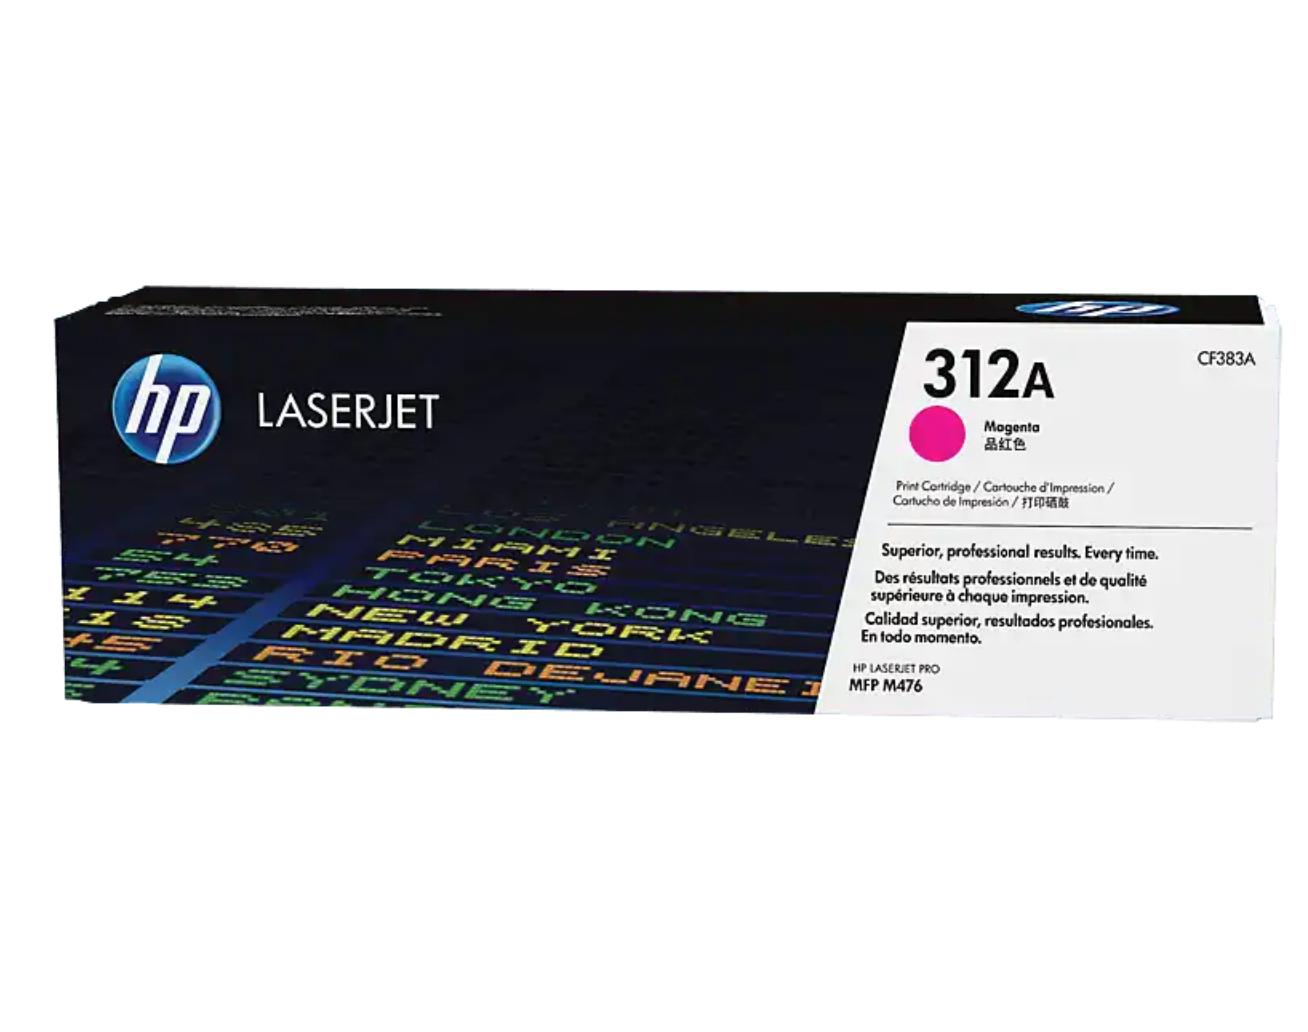 HP 312A 洋紅原廠 LaserJet 碳粉 CF383A